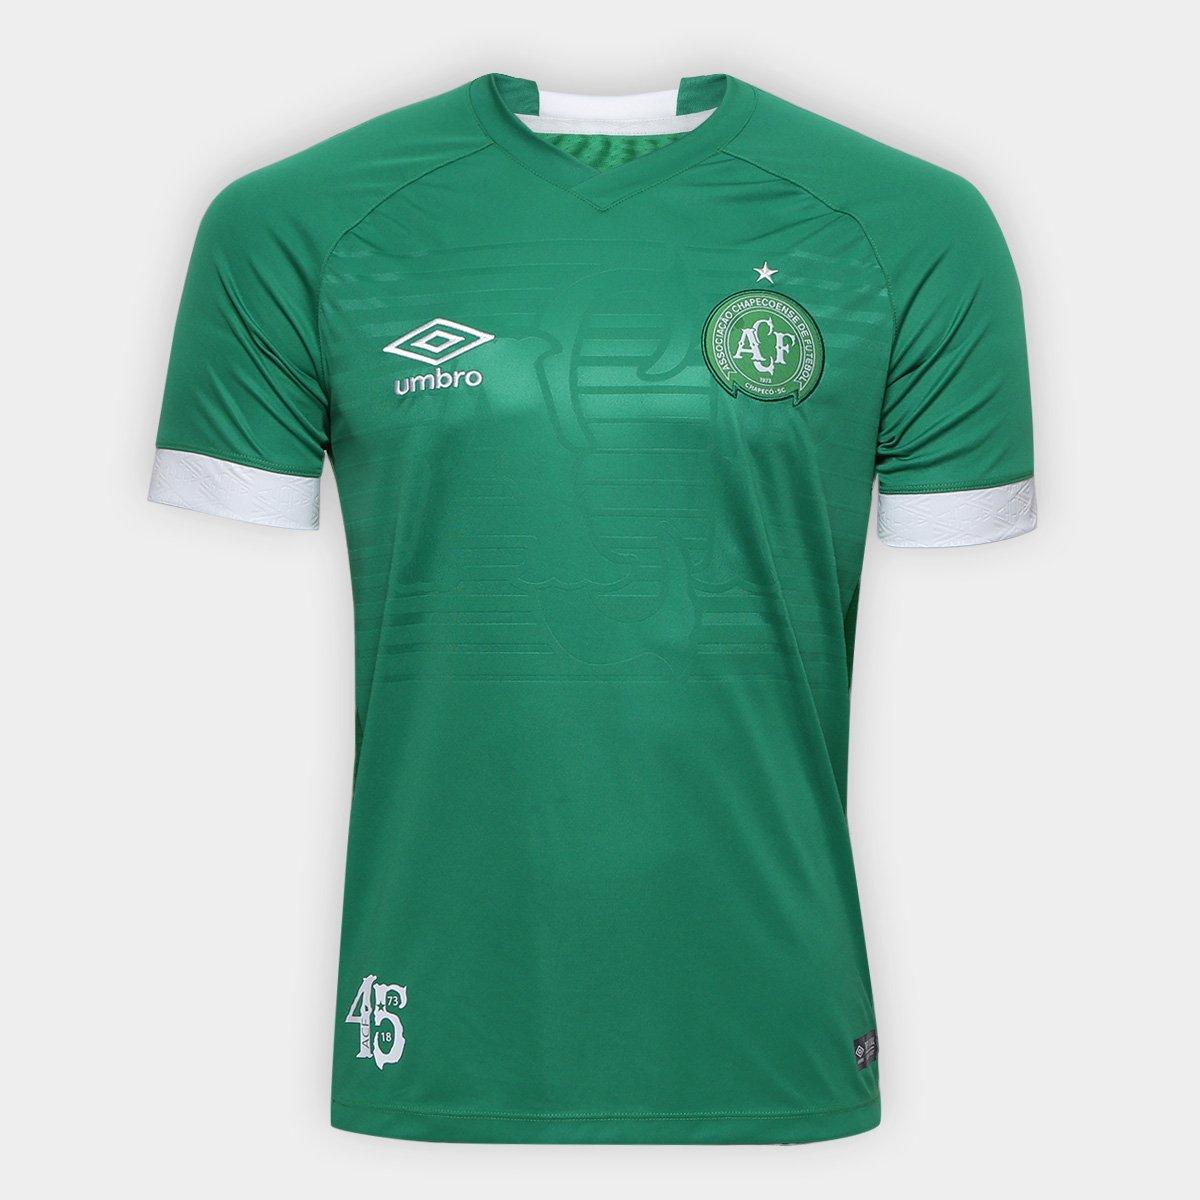 b5c42b3512 Camisa Chapecoense I 2018 s/n° Torcedor Umbro Masculina - Verde e Branco |  Loja da Chape